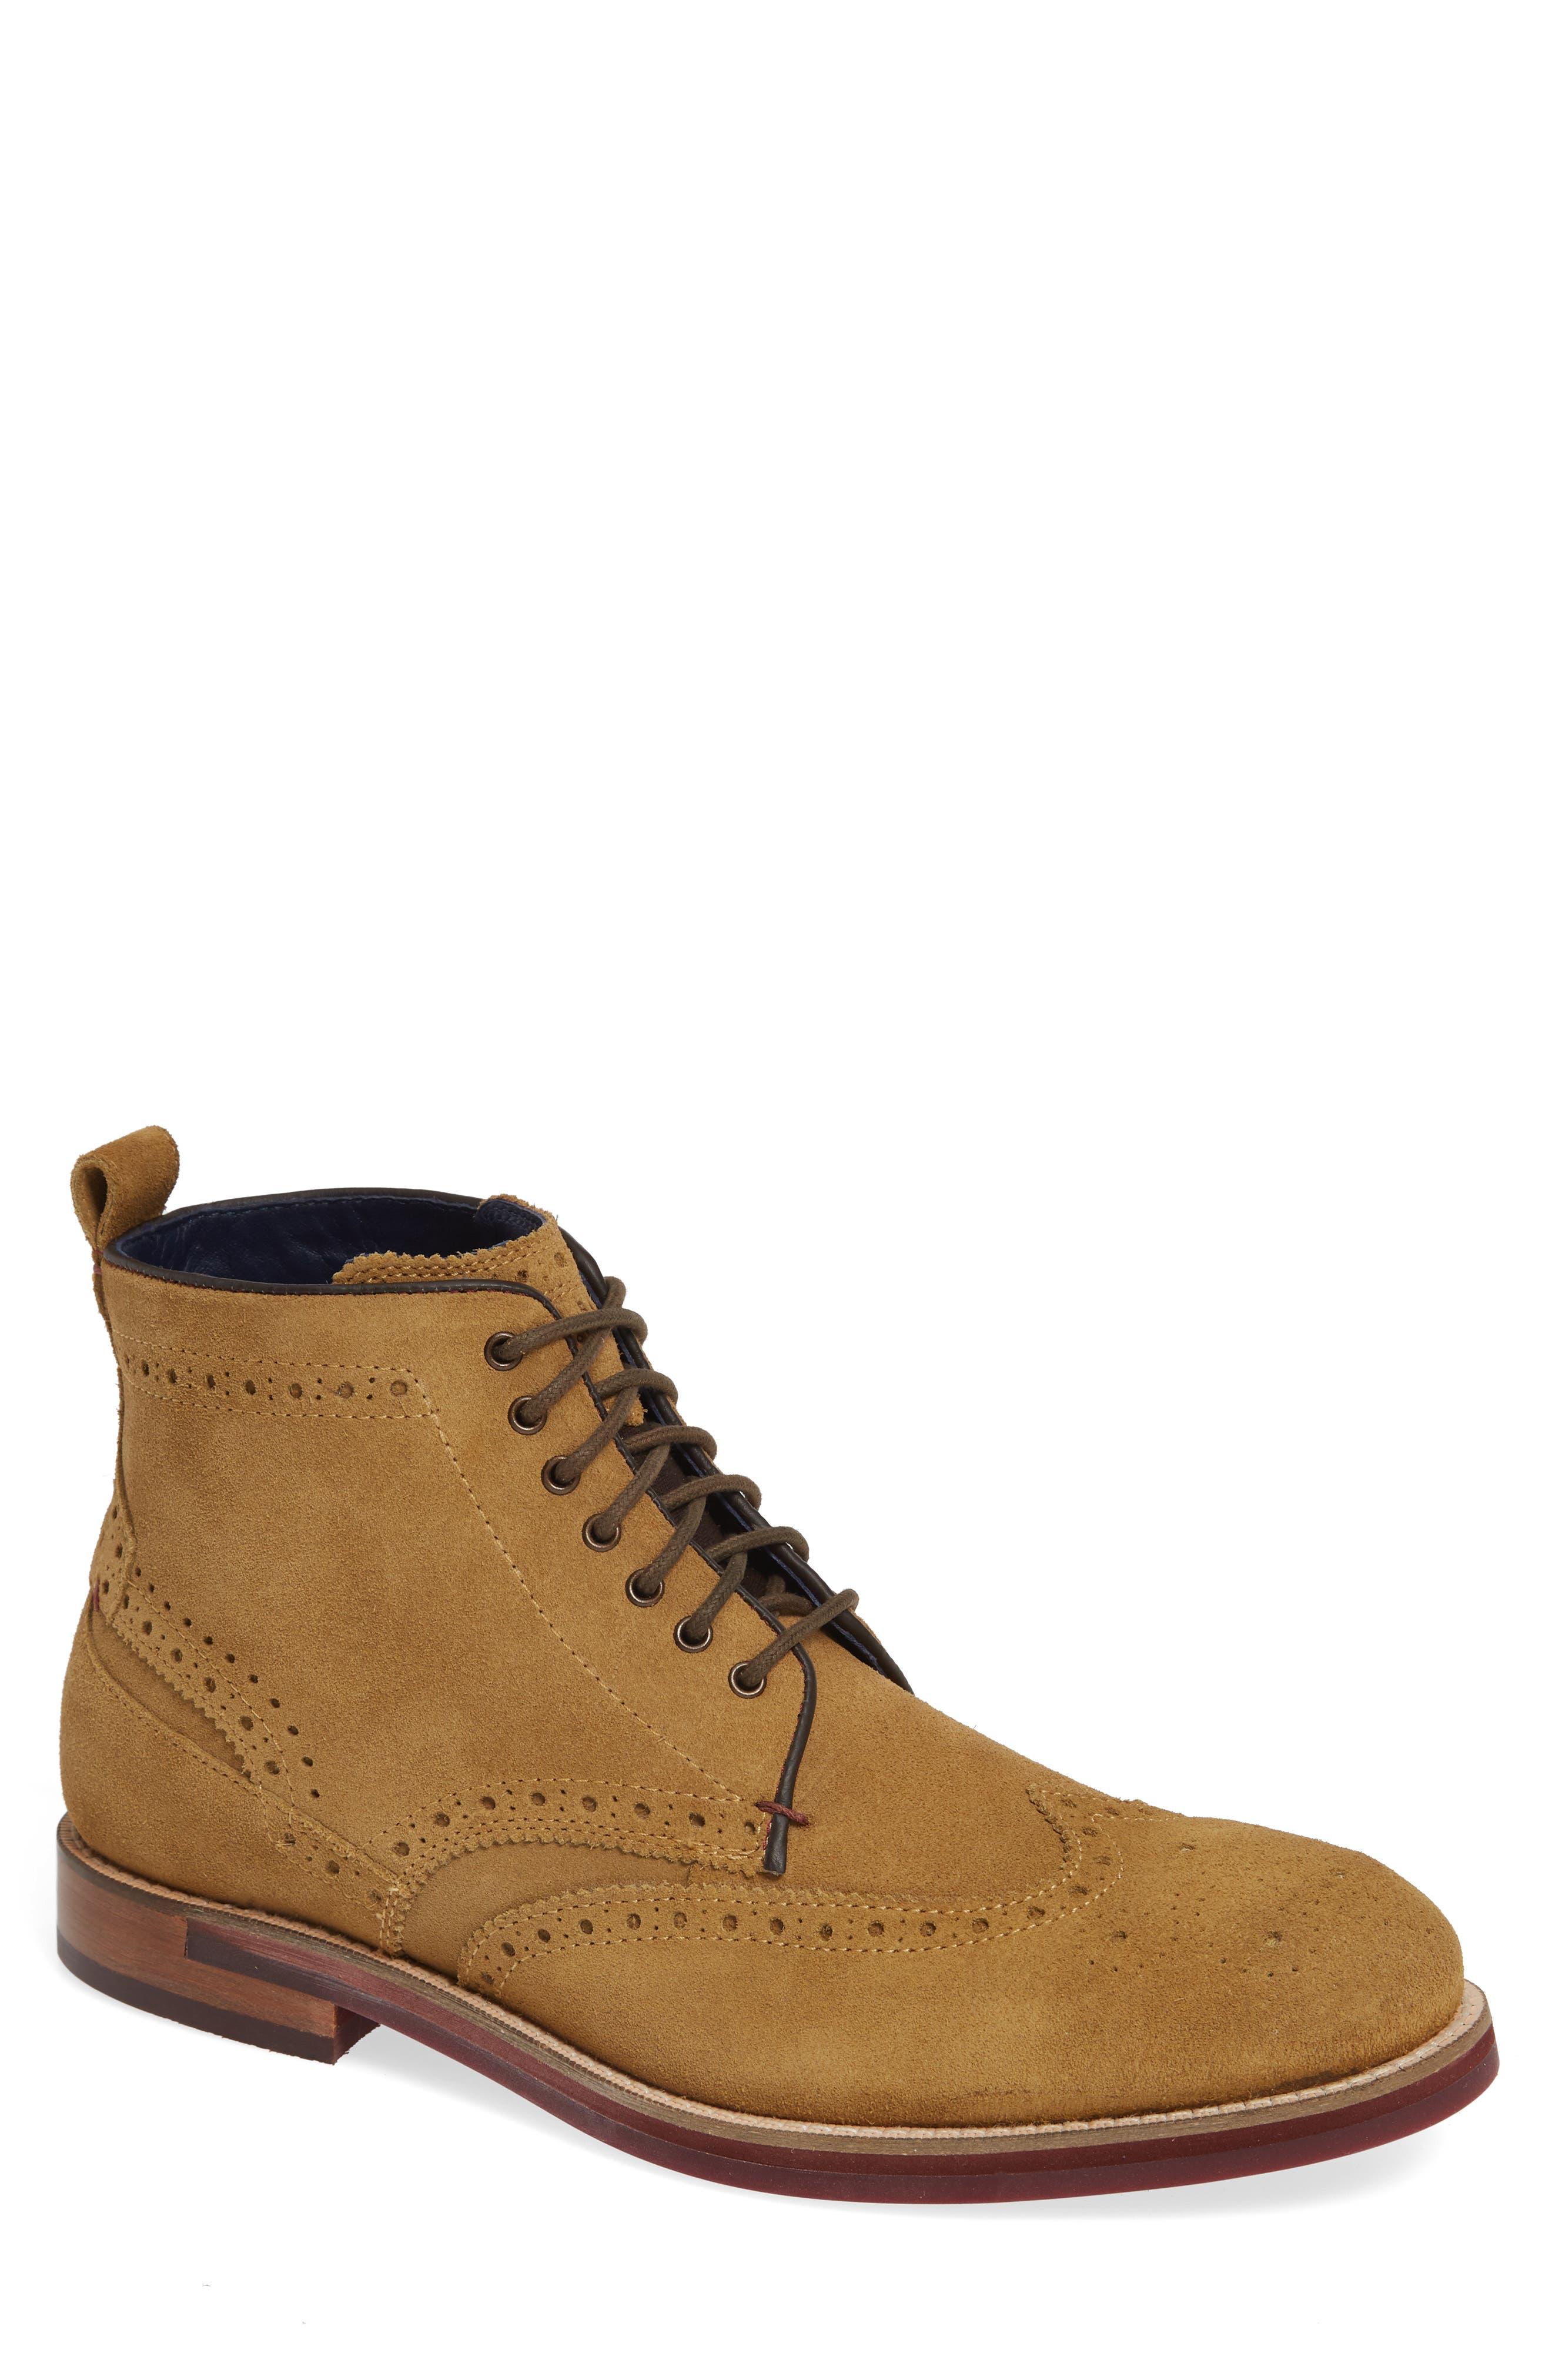 Ted Baker London Shennjo Boot, Yellow